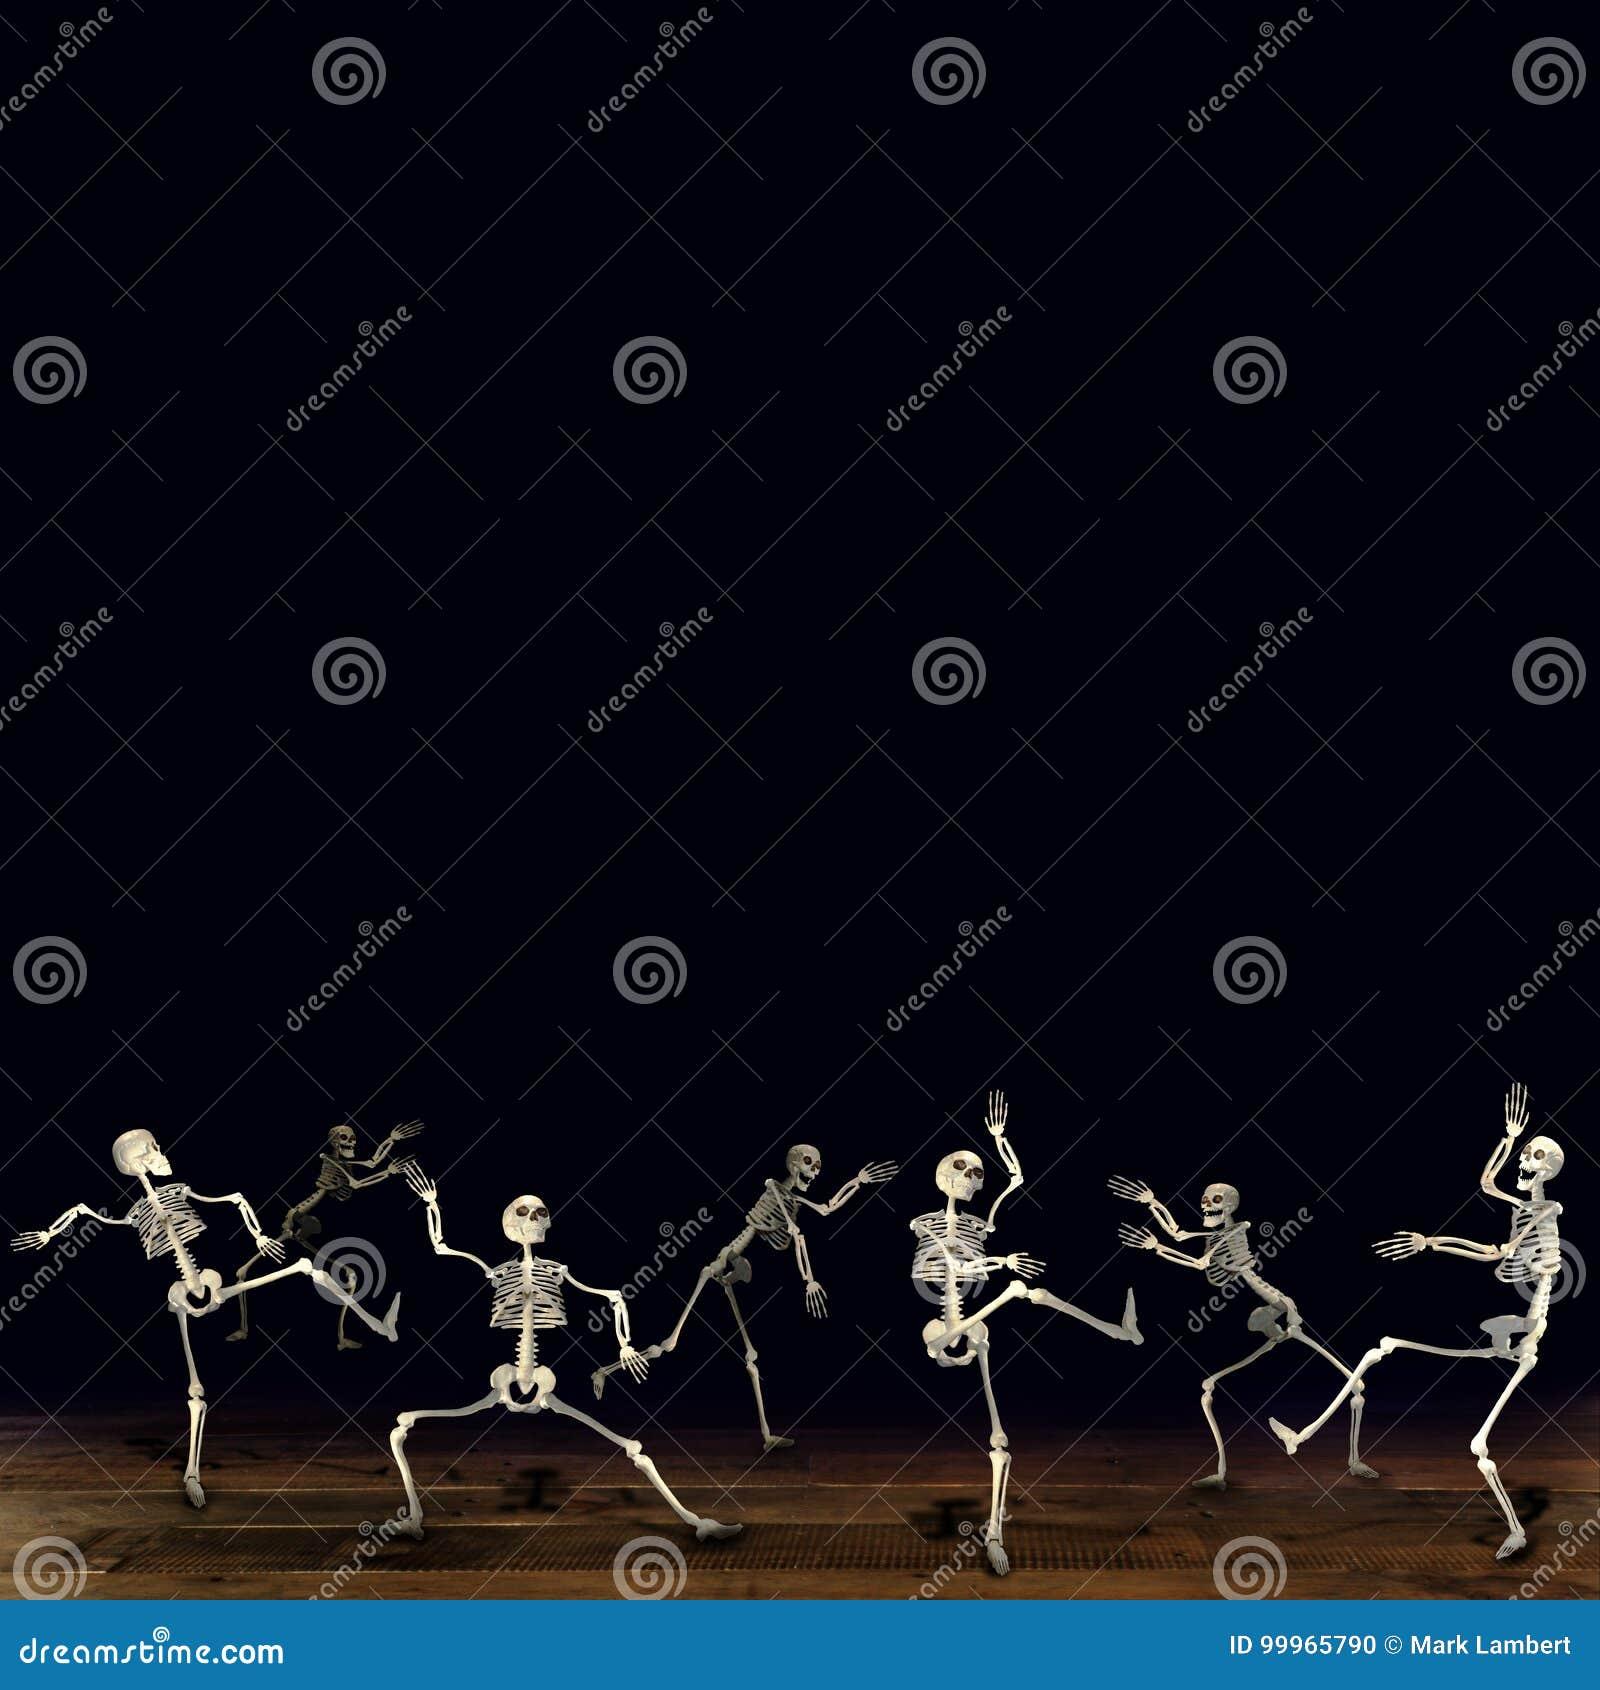 Halloween skeletons. Black background.